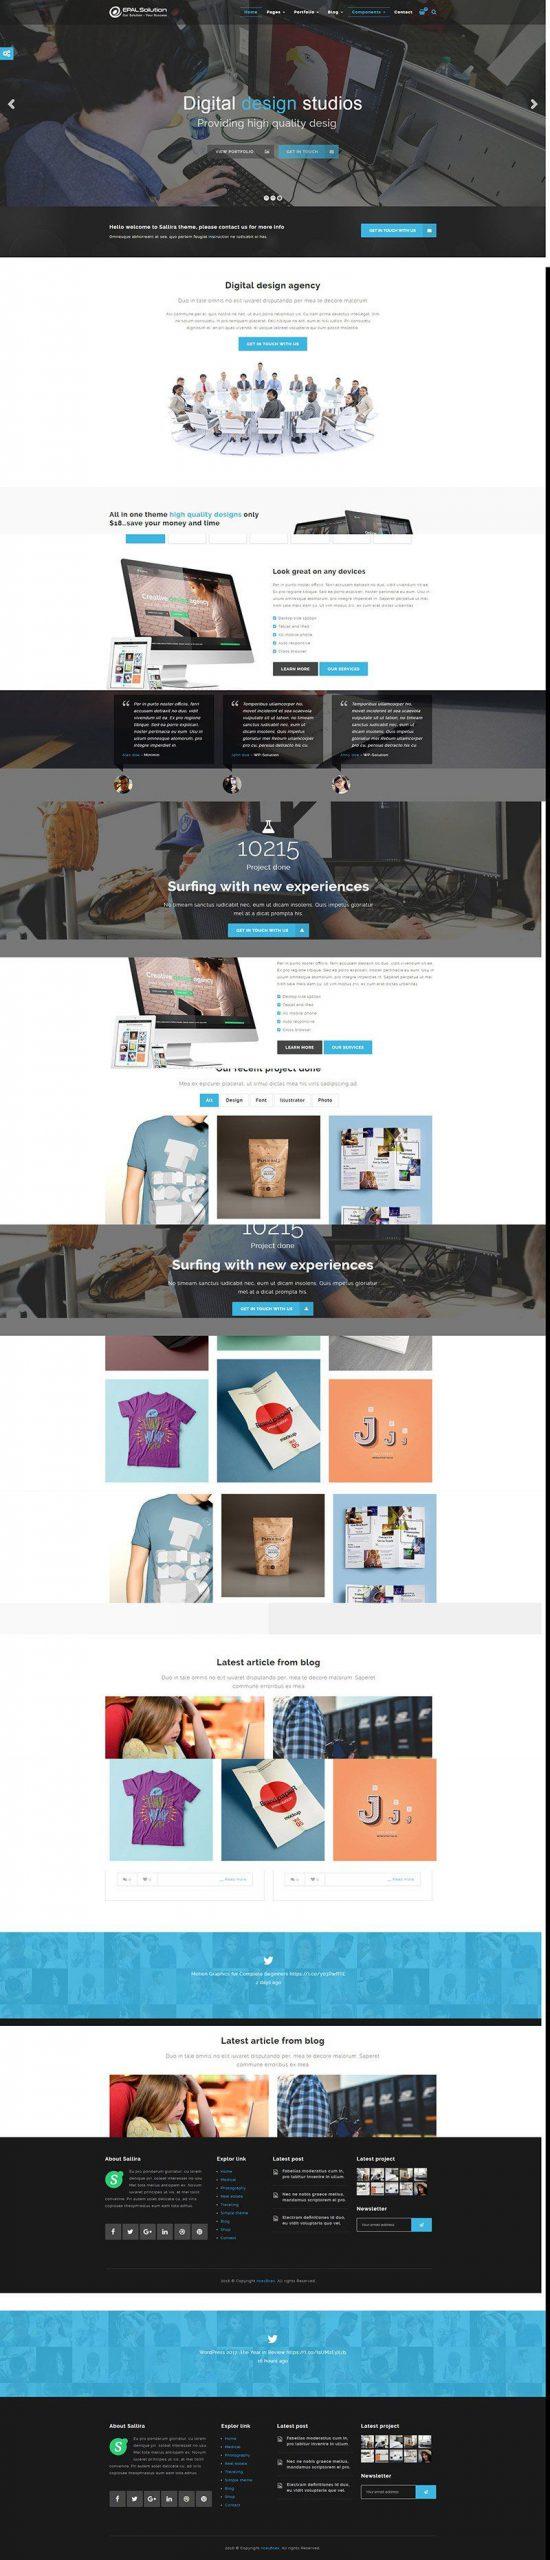 Giao diện website doanh nghiệp Sallira